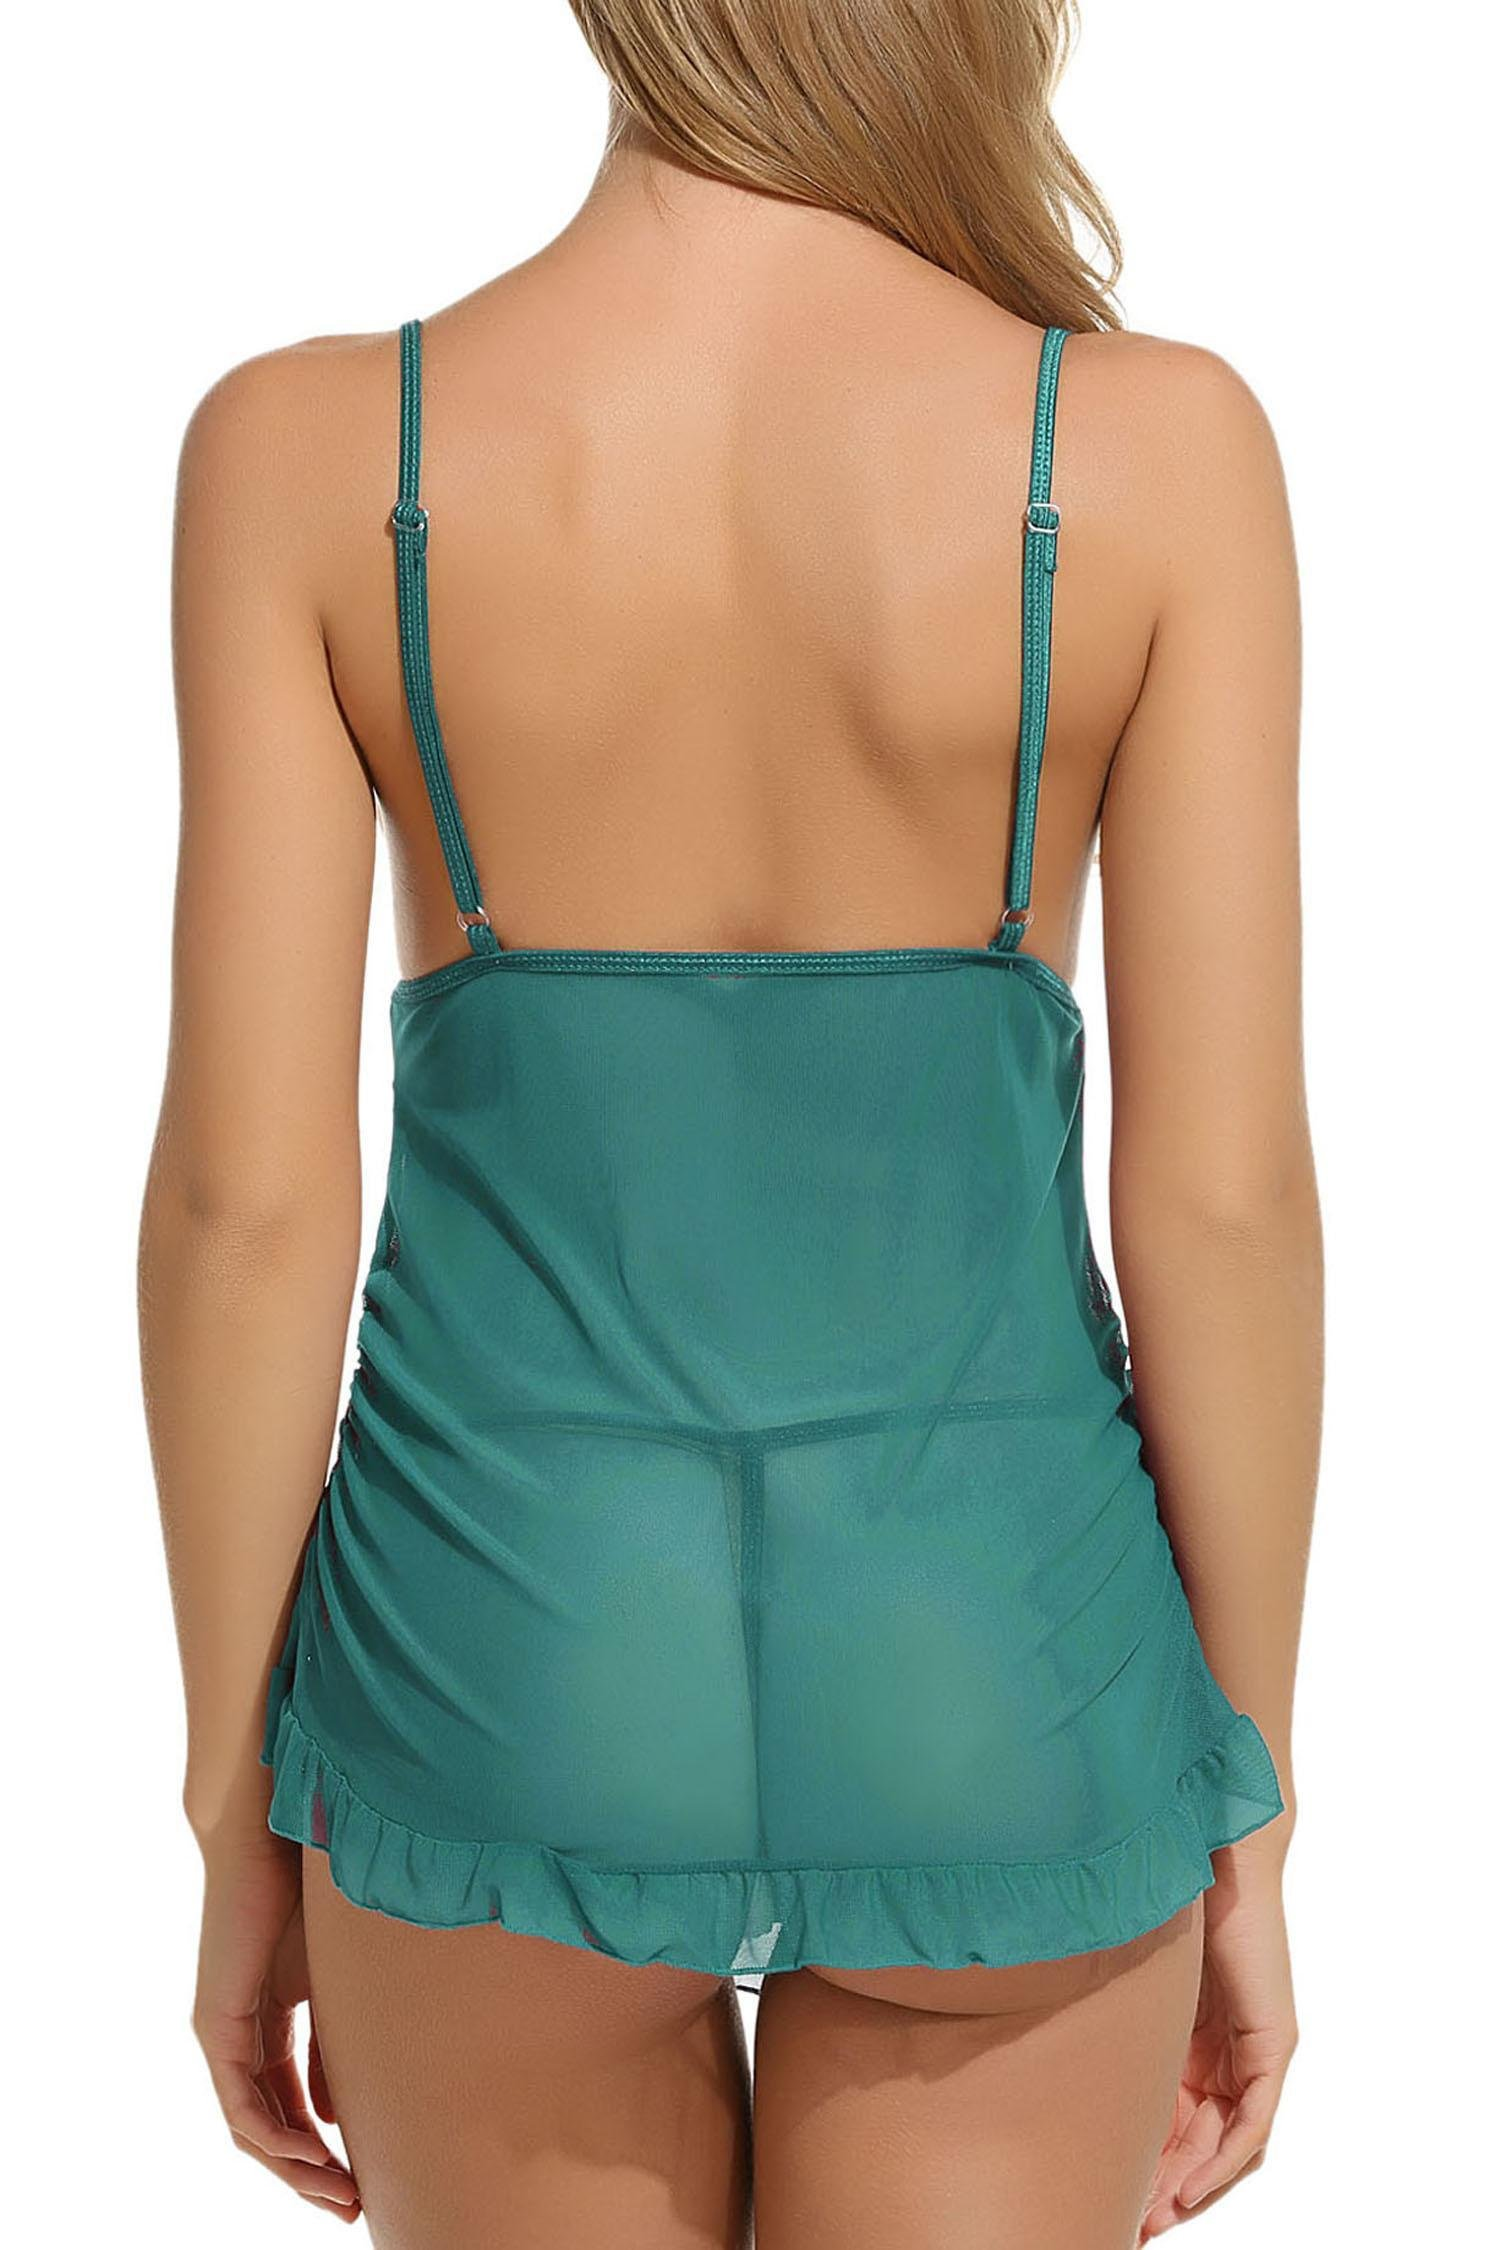 ELOVER Womens Lace Babydoll Sleepwear Halter Nightwear Sexy Lingerie Outfits